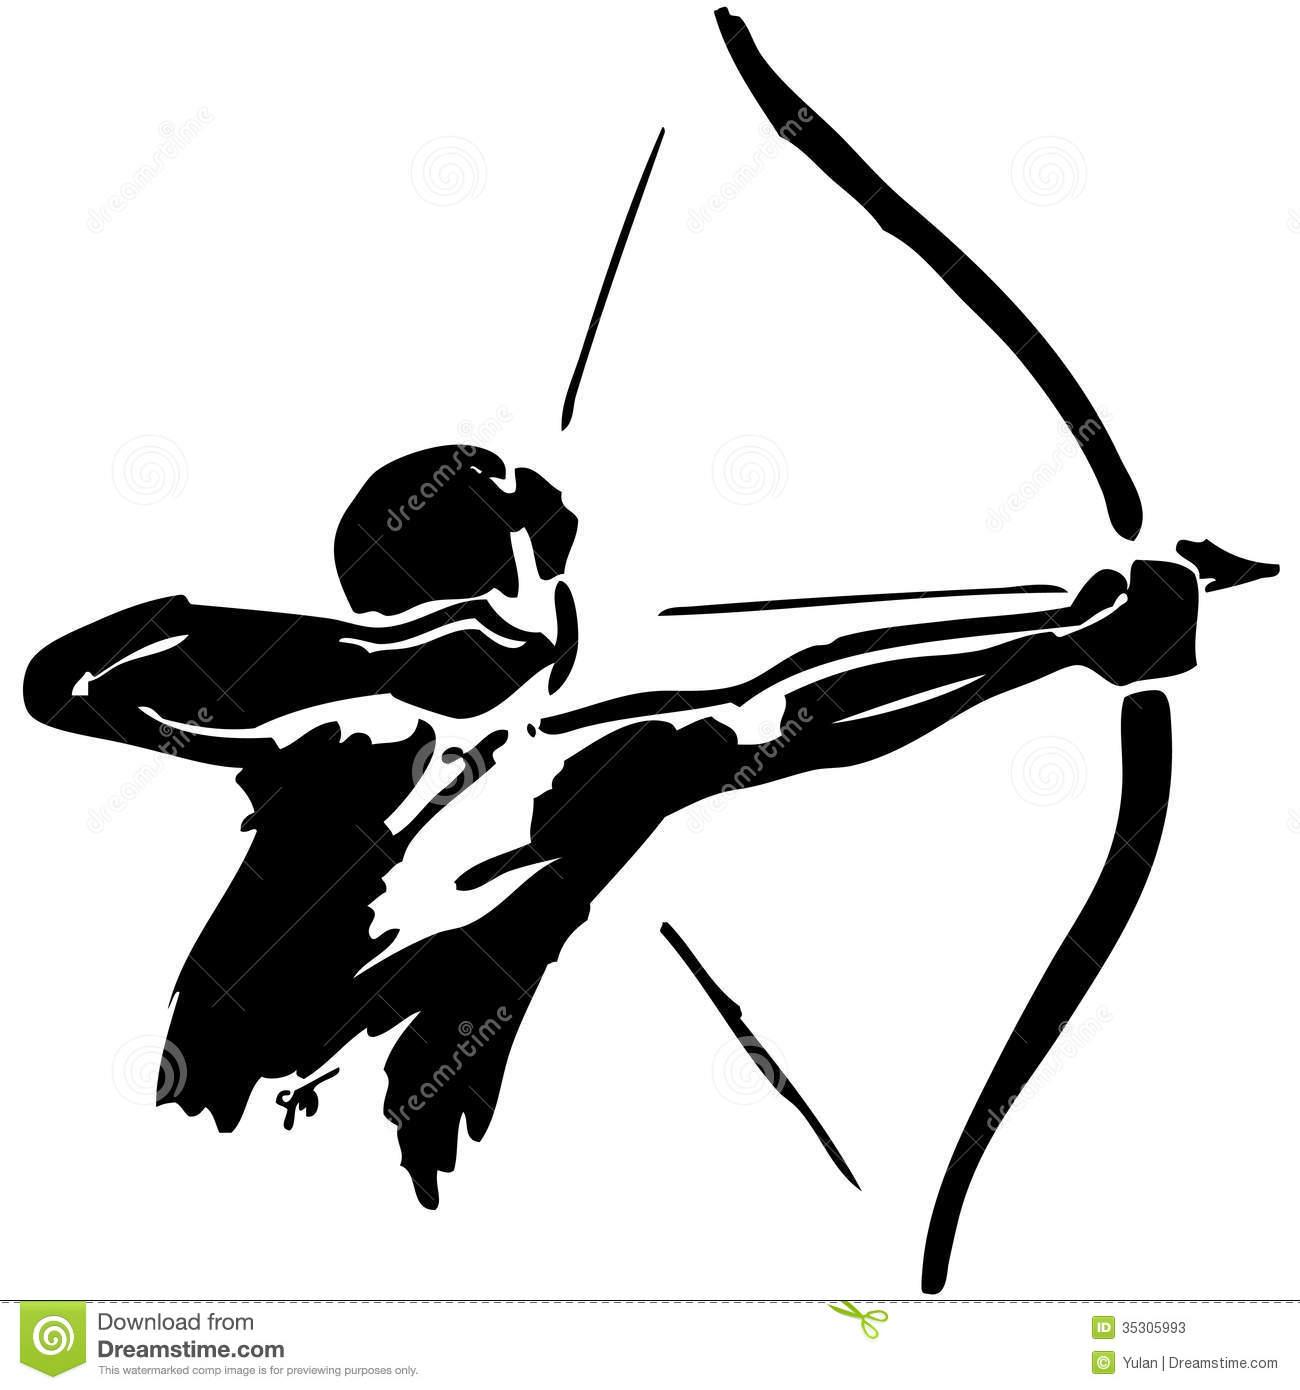 Man practices archery. On white background Stock Photos